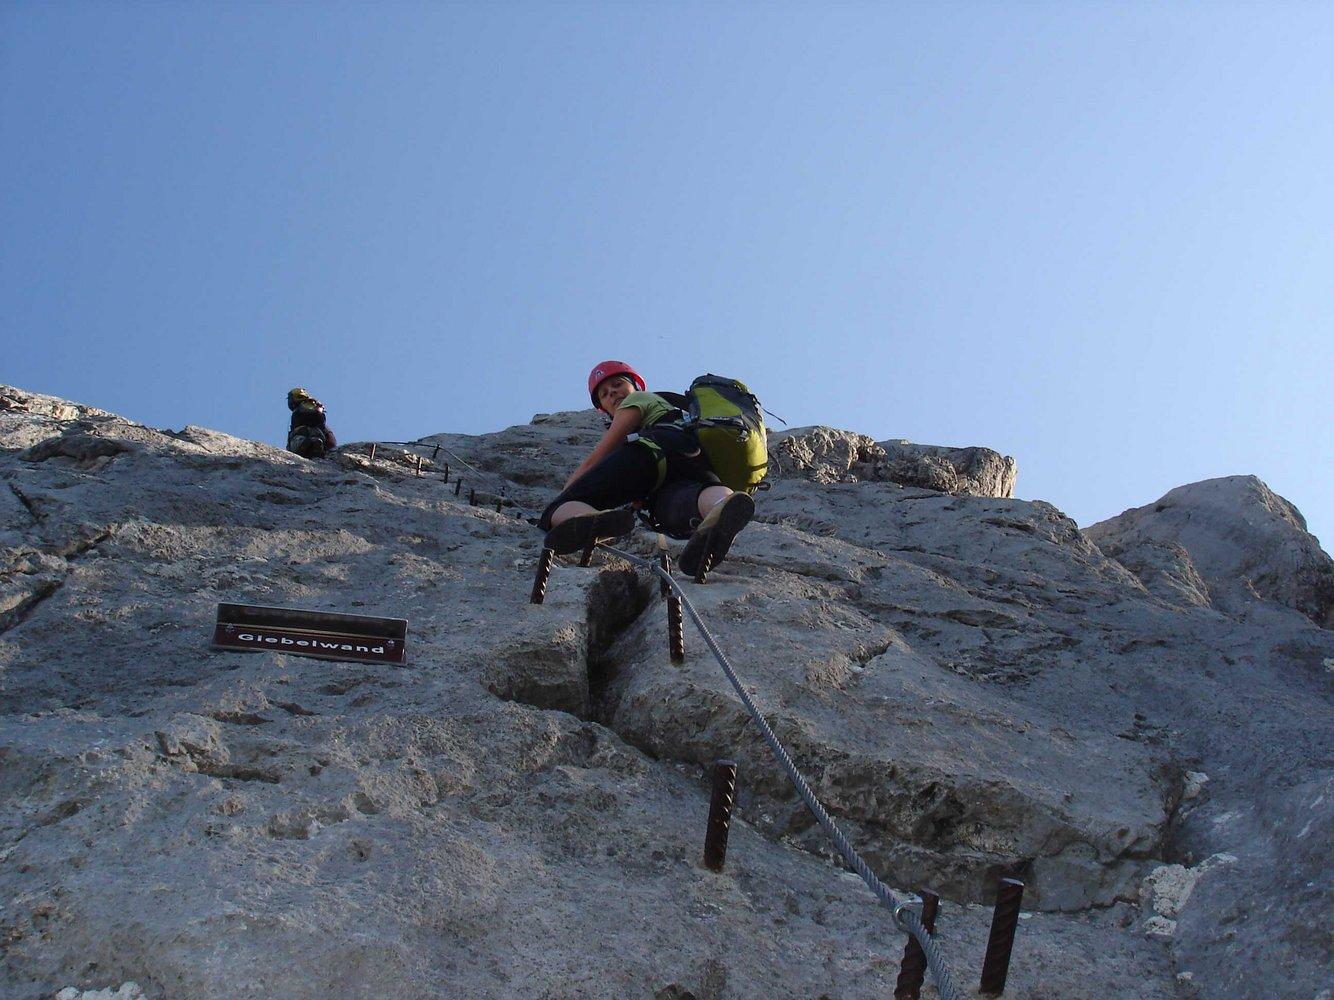 Klettersteig Johann Topo : Anna klettersteig bergsteigen.com